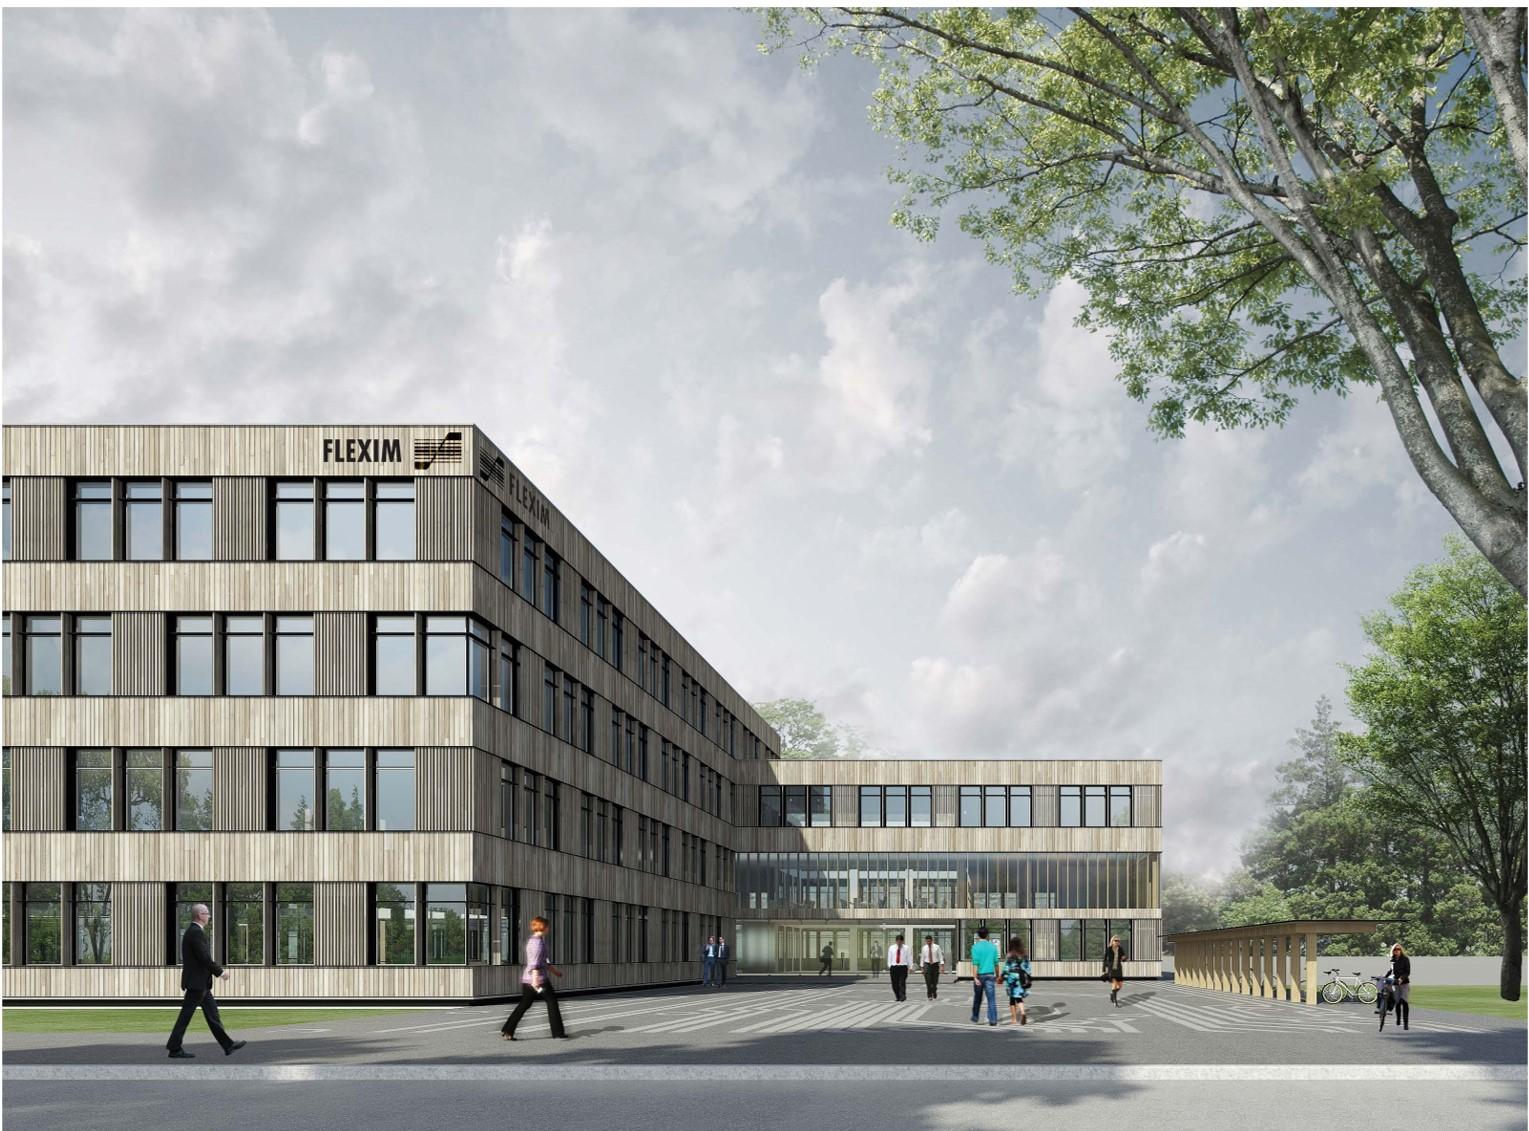 Neubau Firmengebäude Flexim GmbH Berlin_brandschutz plus eberl-pacan brandschutzplaner_Berlin_Holz Beton Hybridbau Perspektive